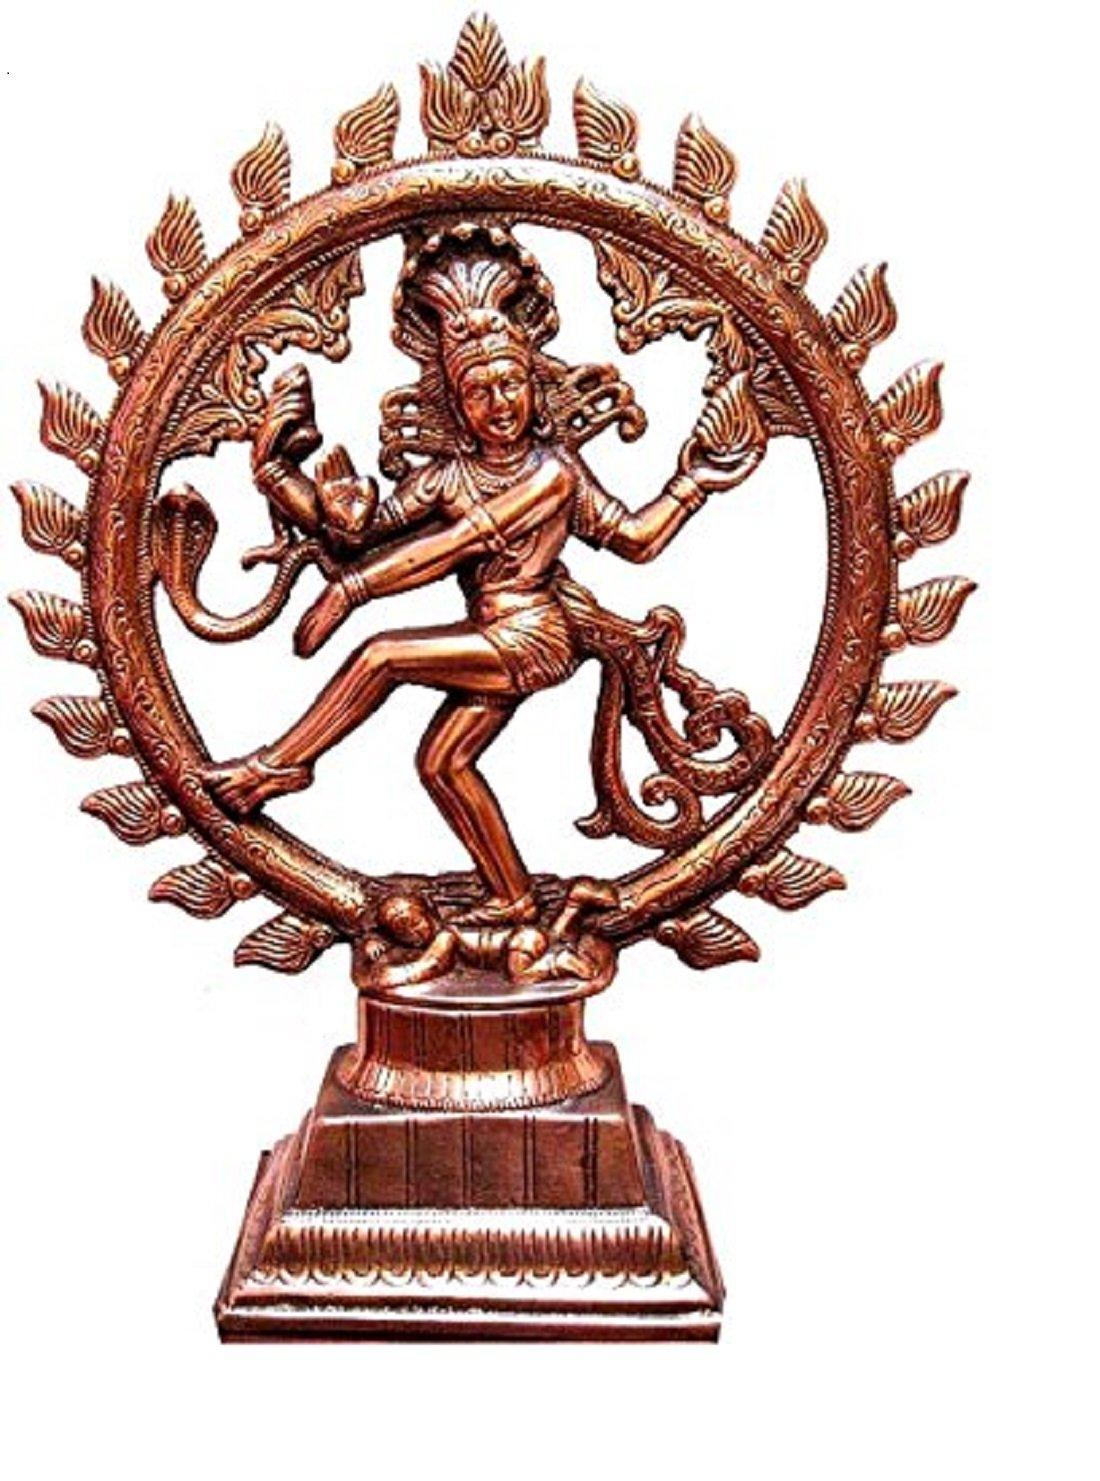 ZASSBY ENTERPRISES 17inch Dancing Lord Shiva Natraj God of Dance Natraja Copper Plated Metal Statue